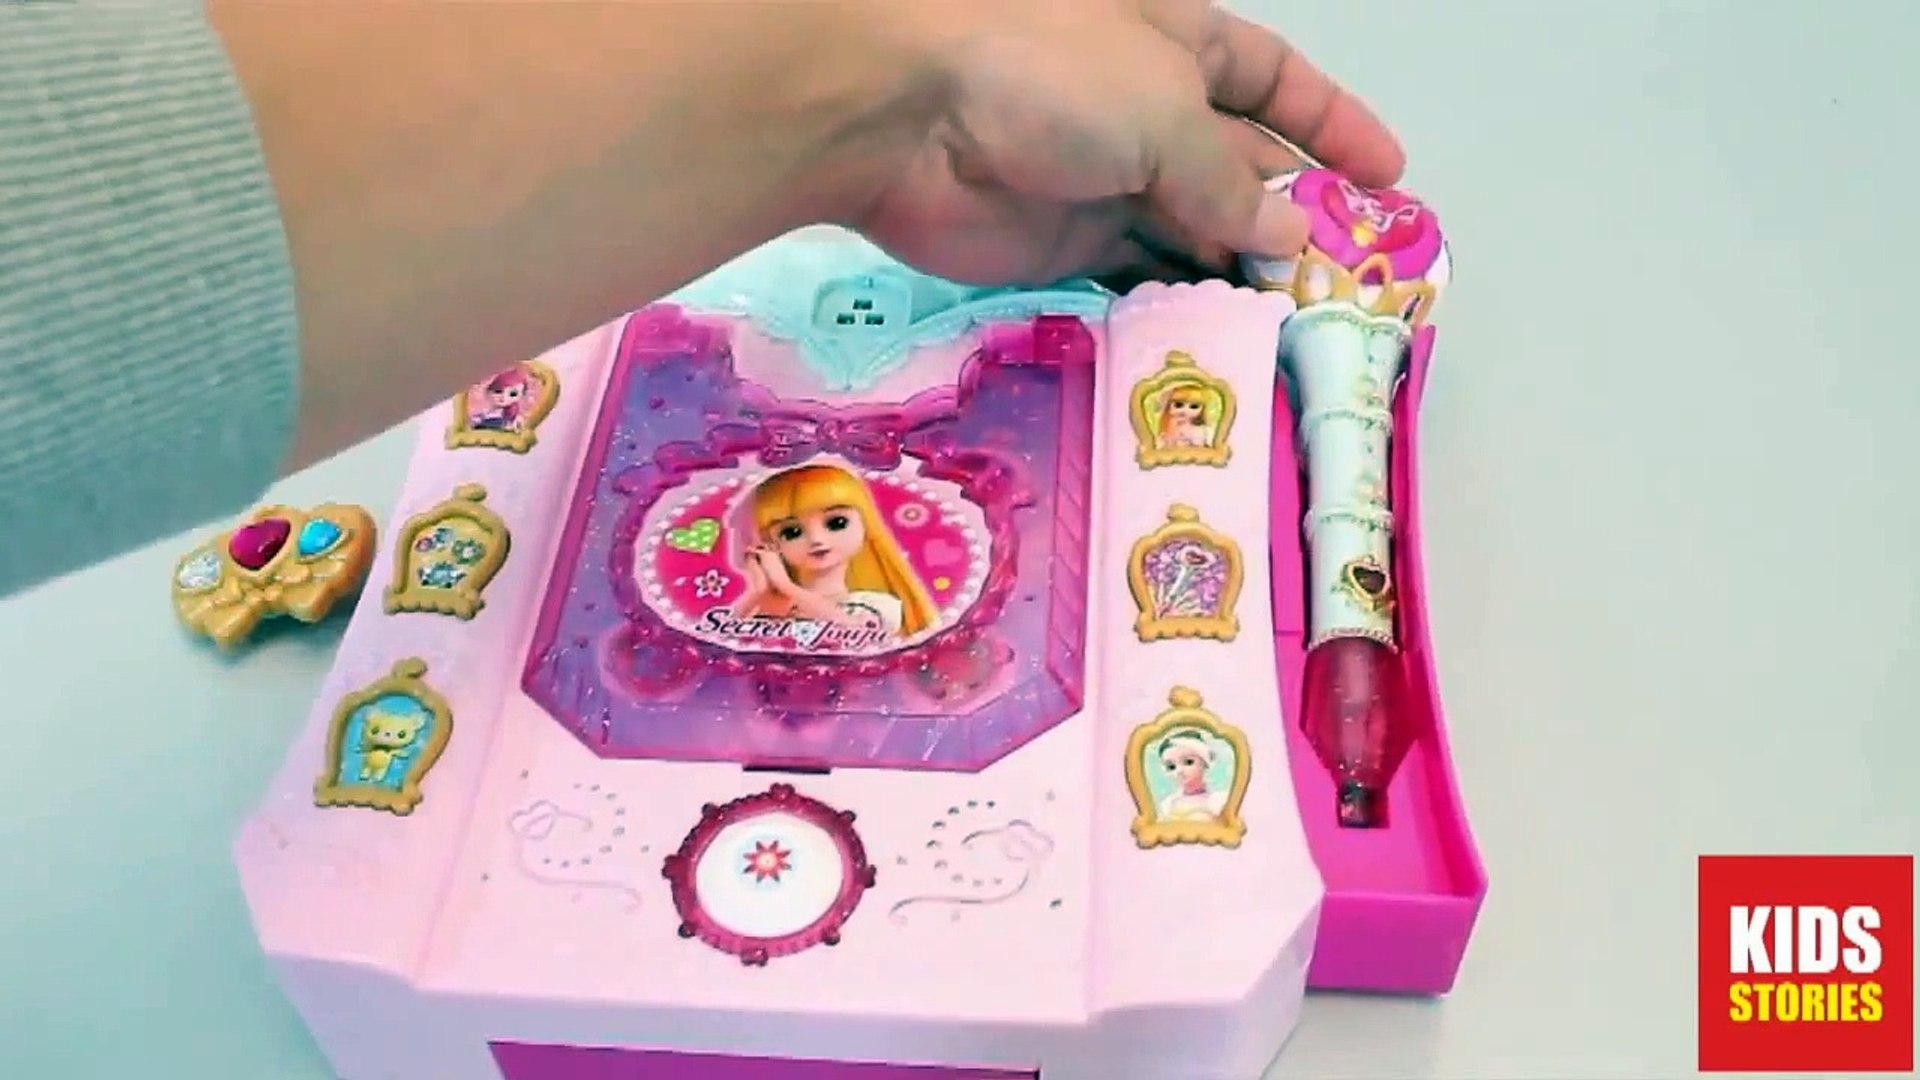 Video Tutorial Mainan Anak Edukatif Mainan Barbie Princes Pena Touch Pad Terbaru Bagian 7 Video Dailymotion